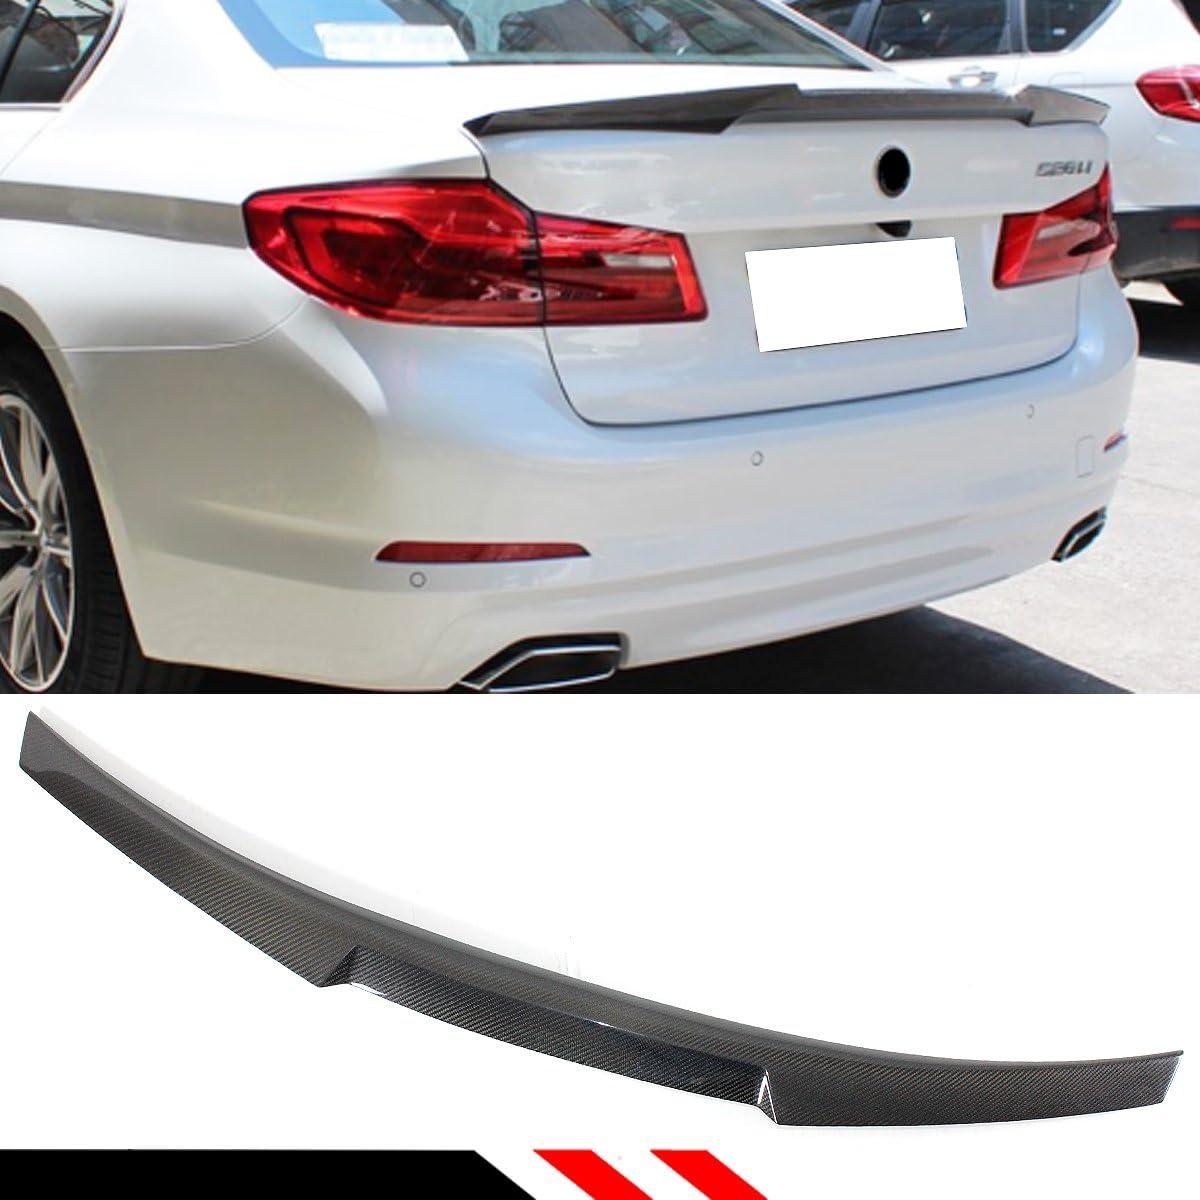 Fits 2017-2020 BMW 5-Series G30 M4 Style Carbon Fiber CF Trunk Spoiler